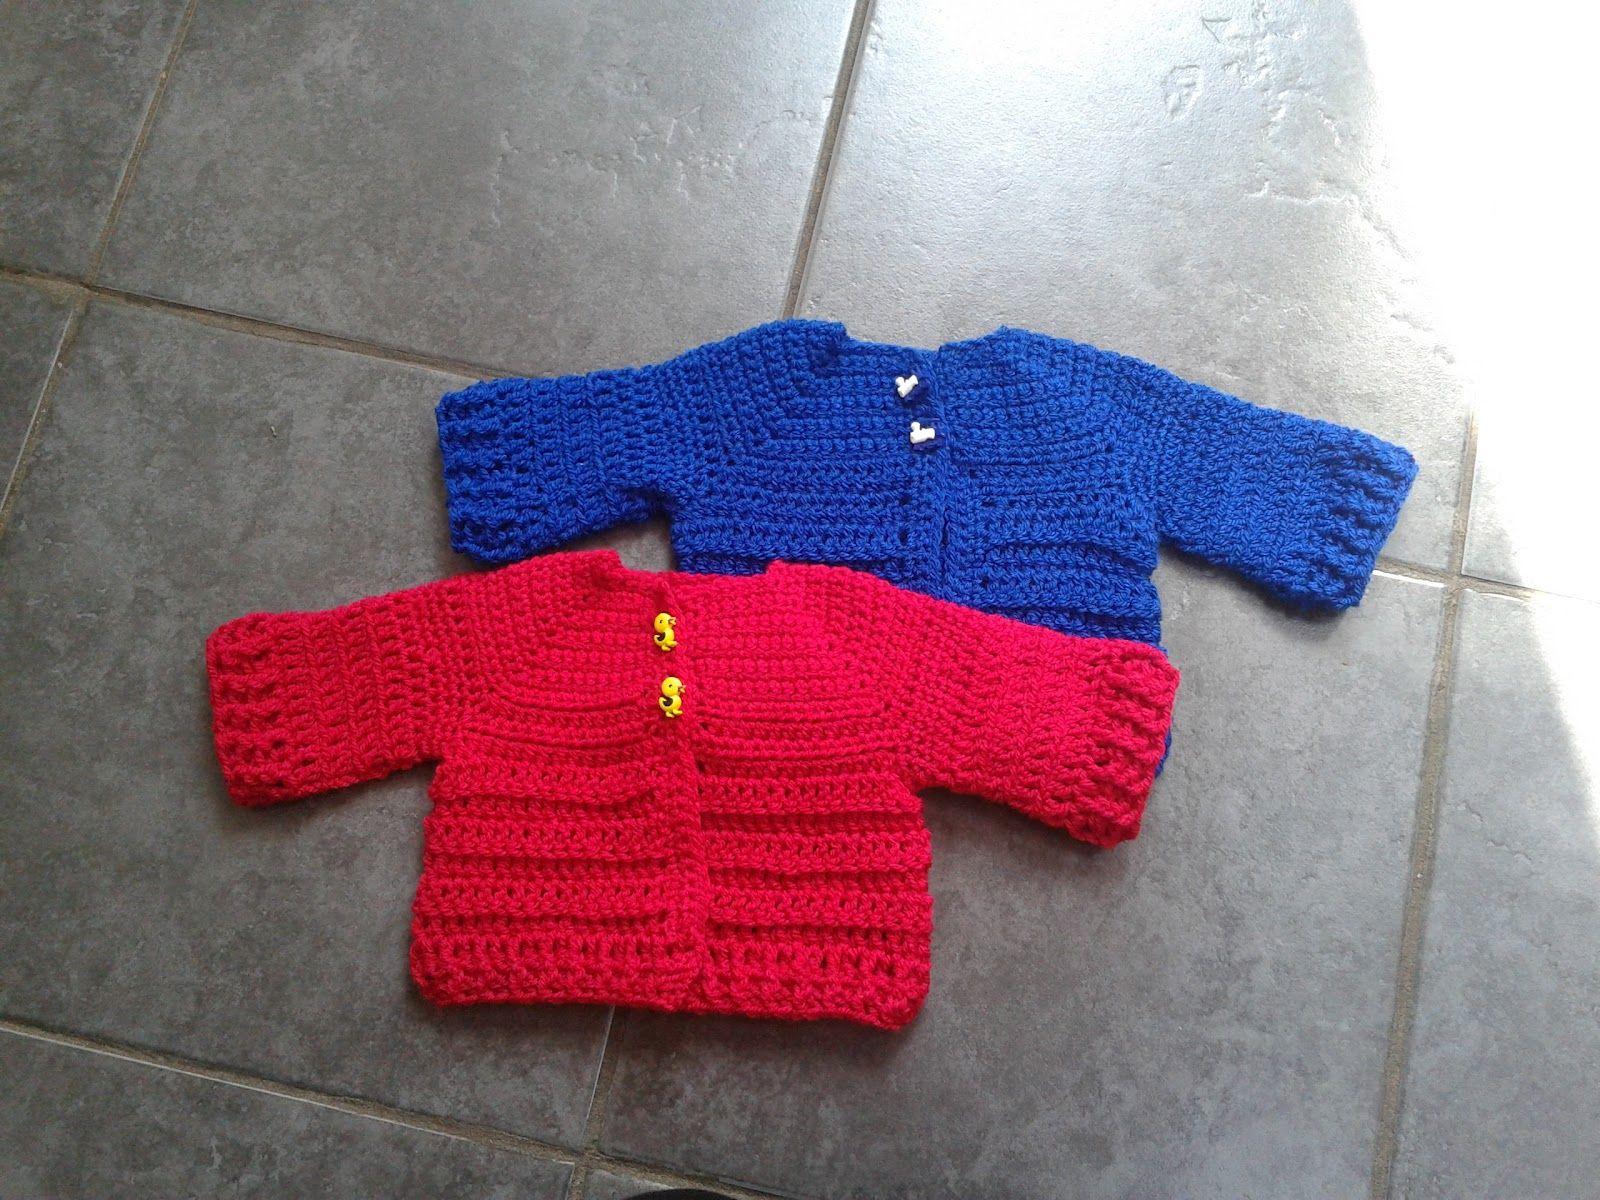 Lolly\'s Crafty Crochet: Free Pattern: Chunky Monkey Cardigan ...